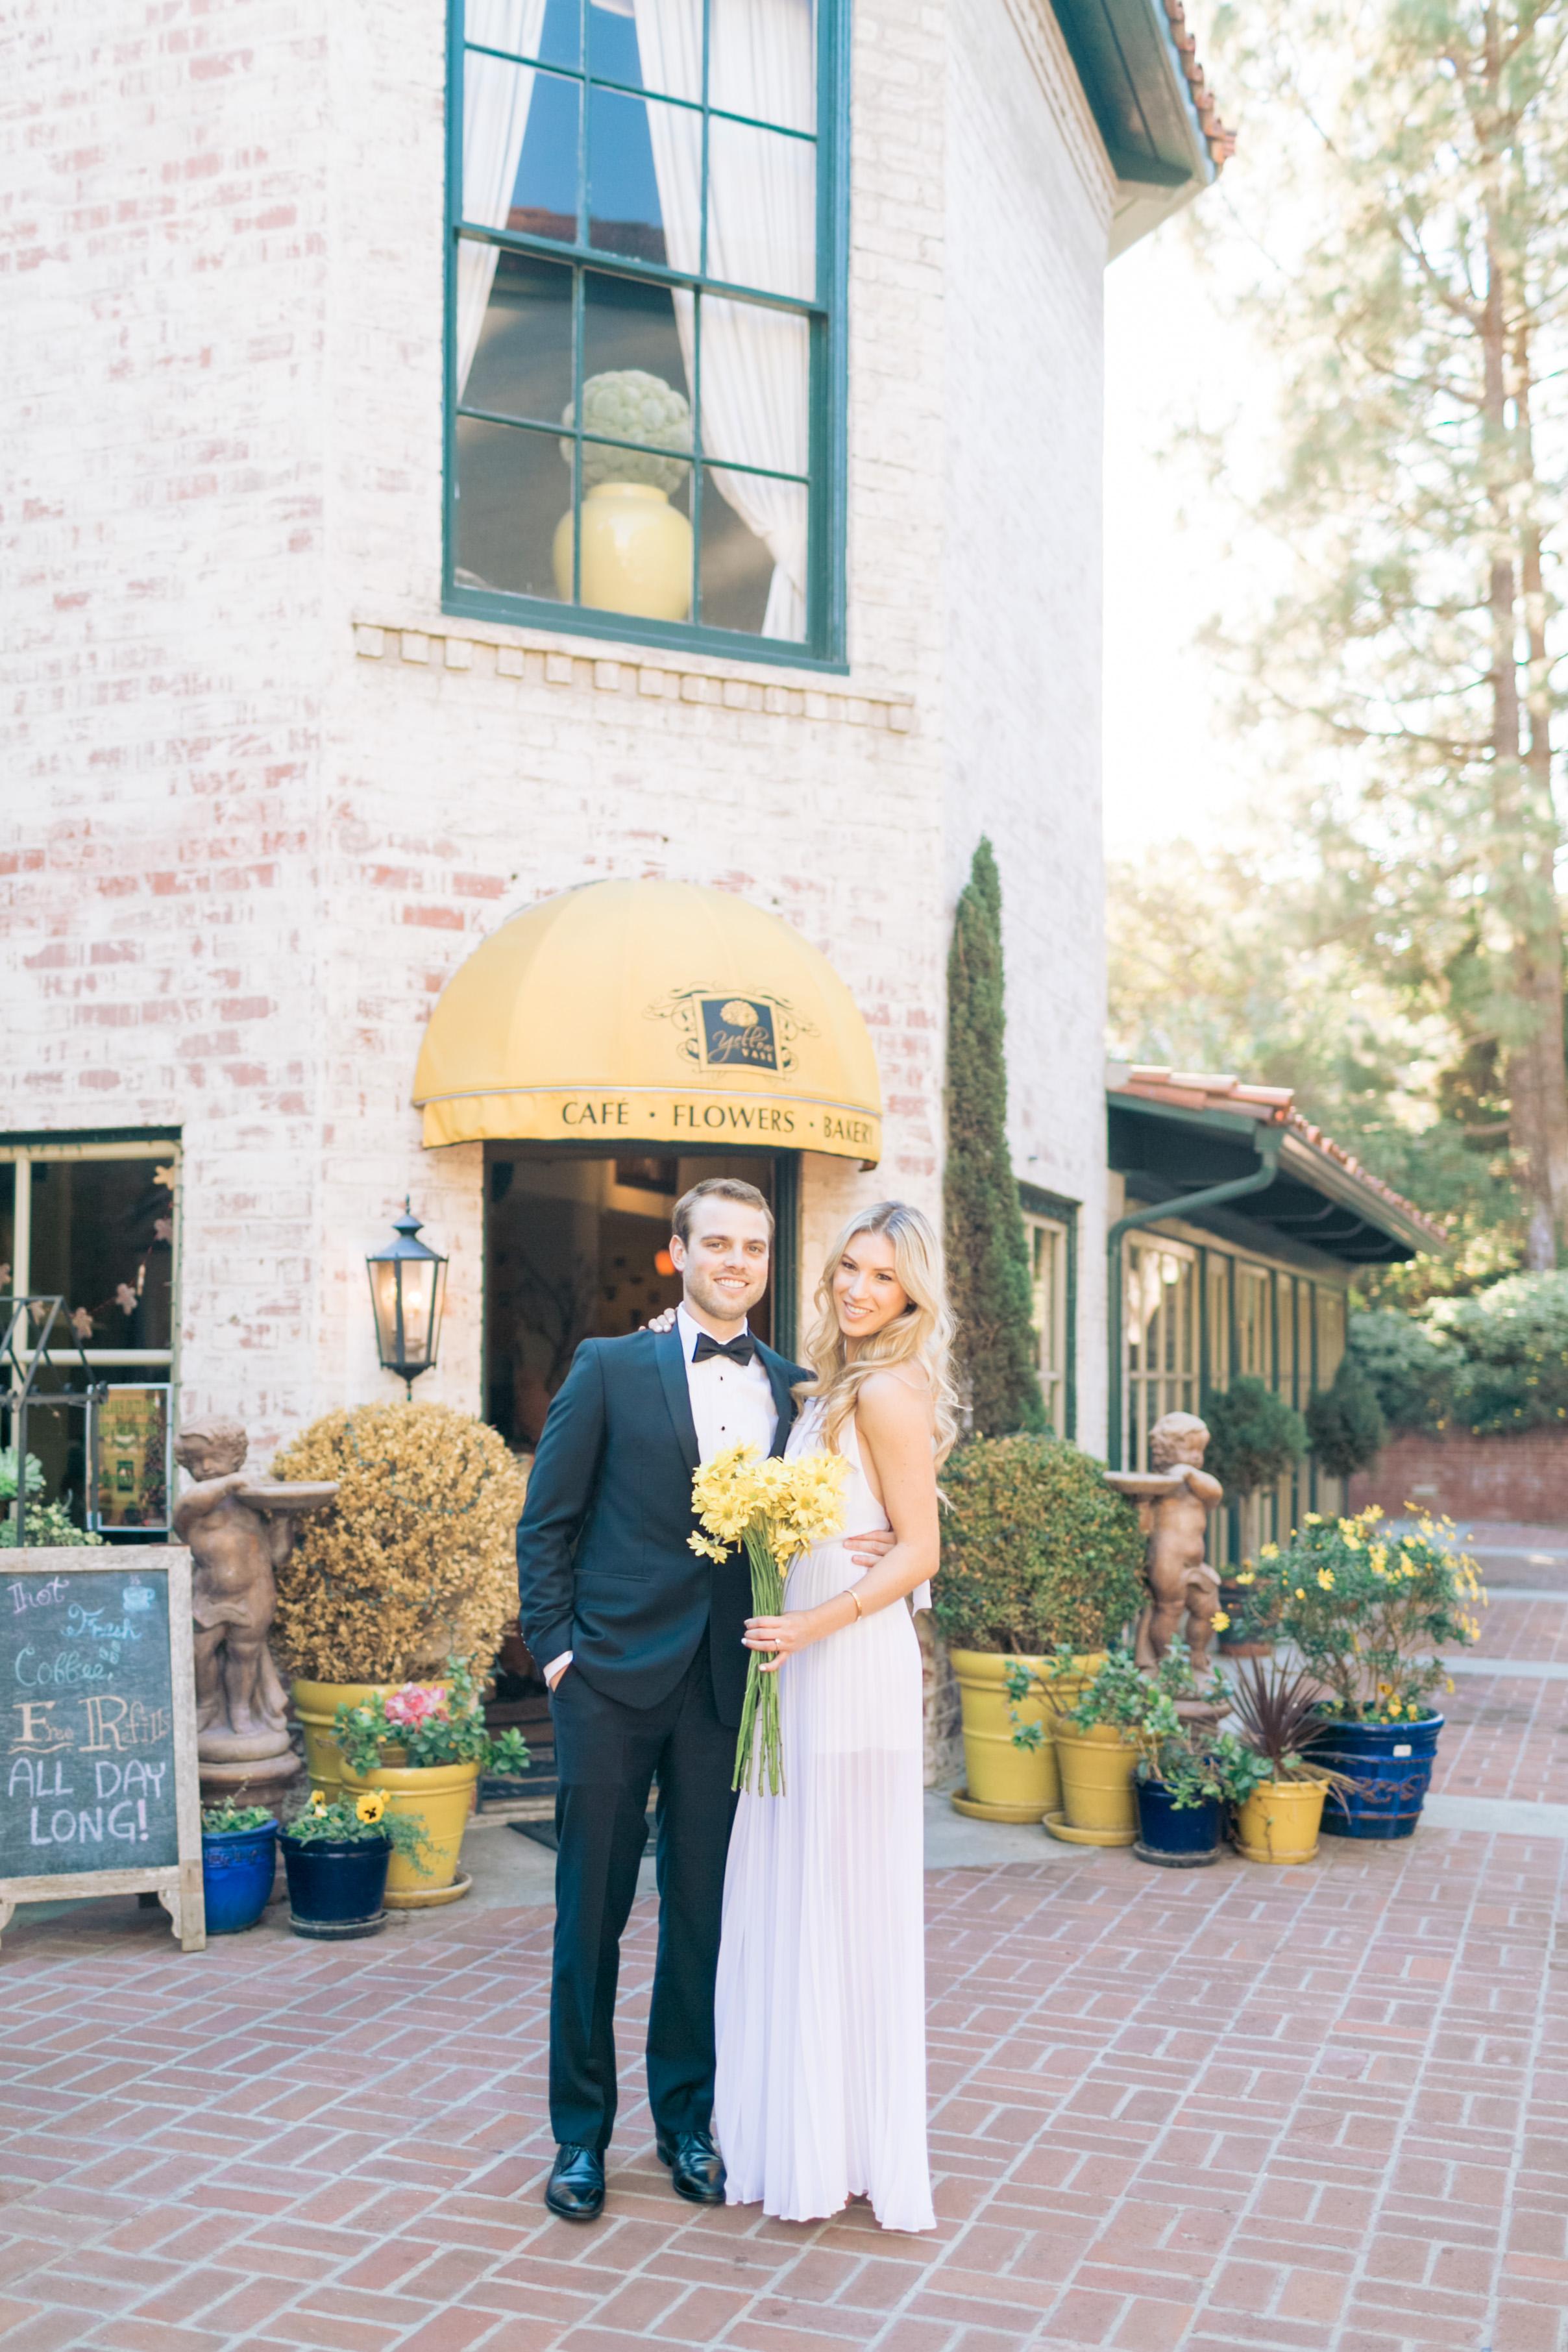 2015Natalie Schutt Photography- Palos Verdes Wedding-28.JPG